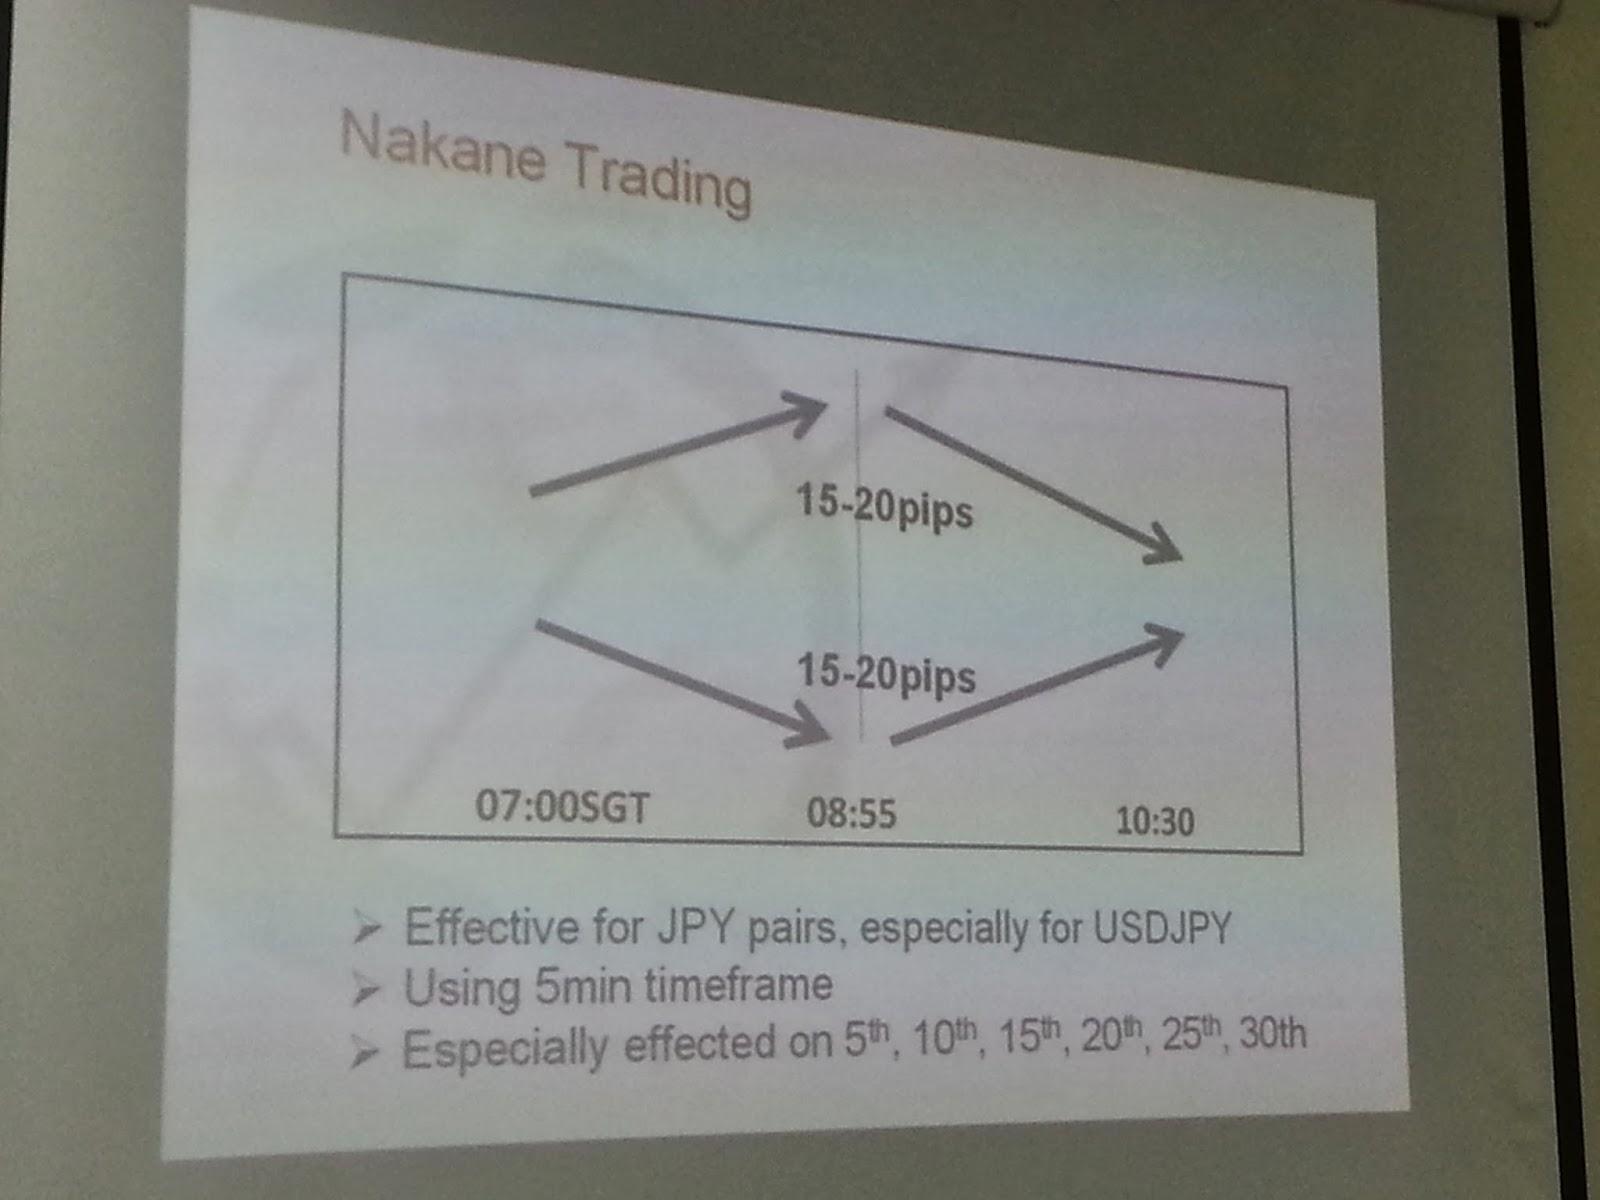 Trading strategies syllabus